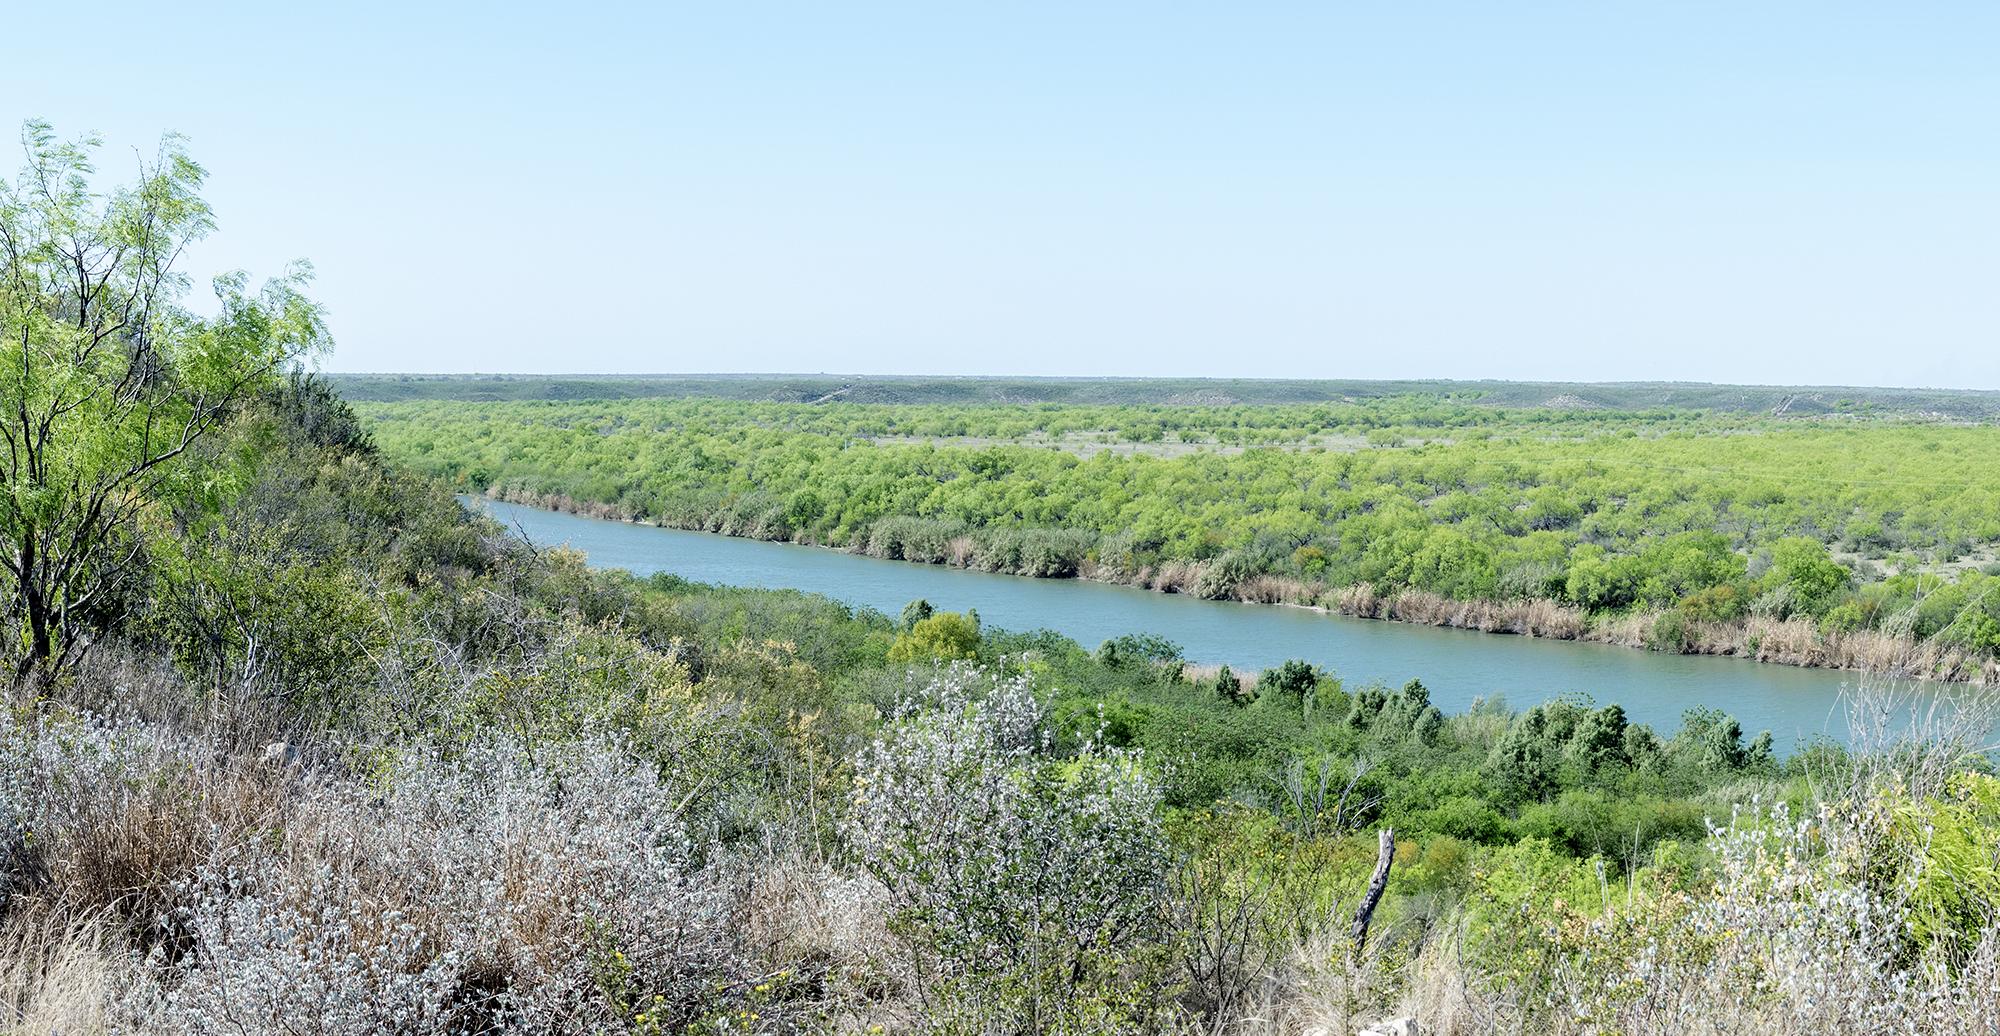 South Texas Plains ecoregion of the San Antonio River